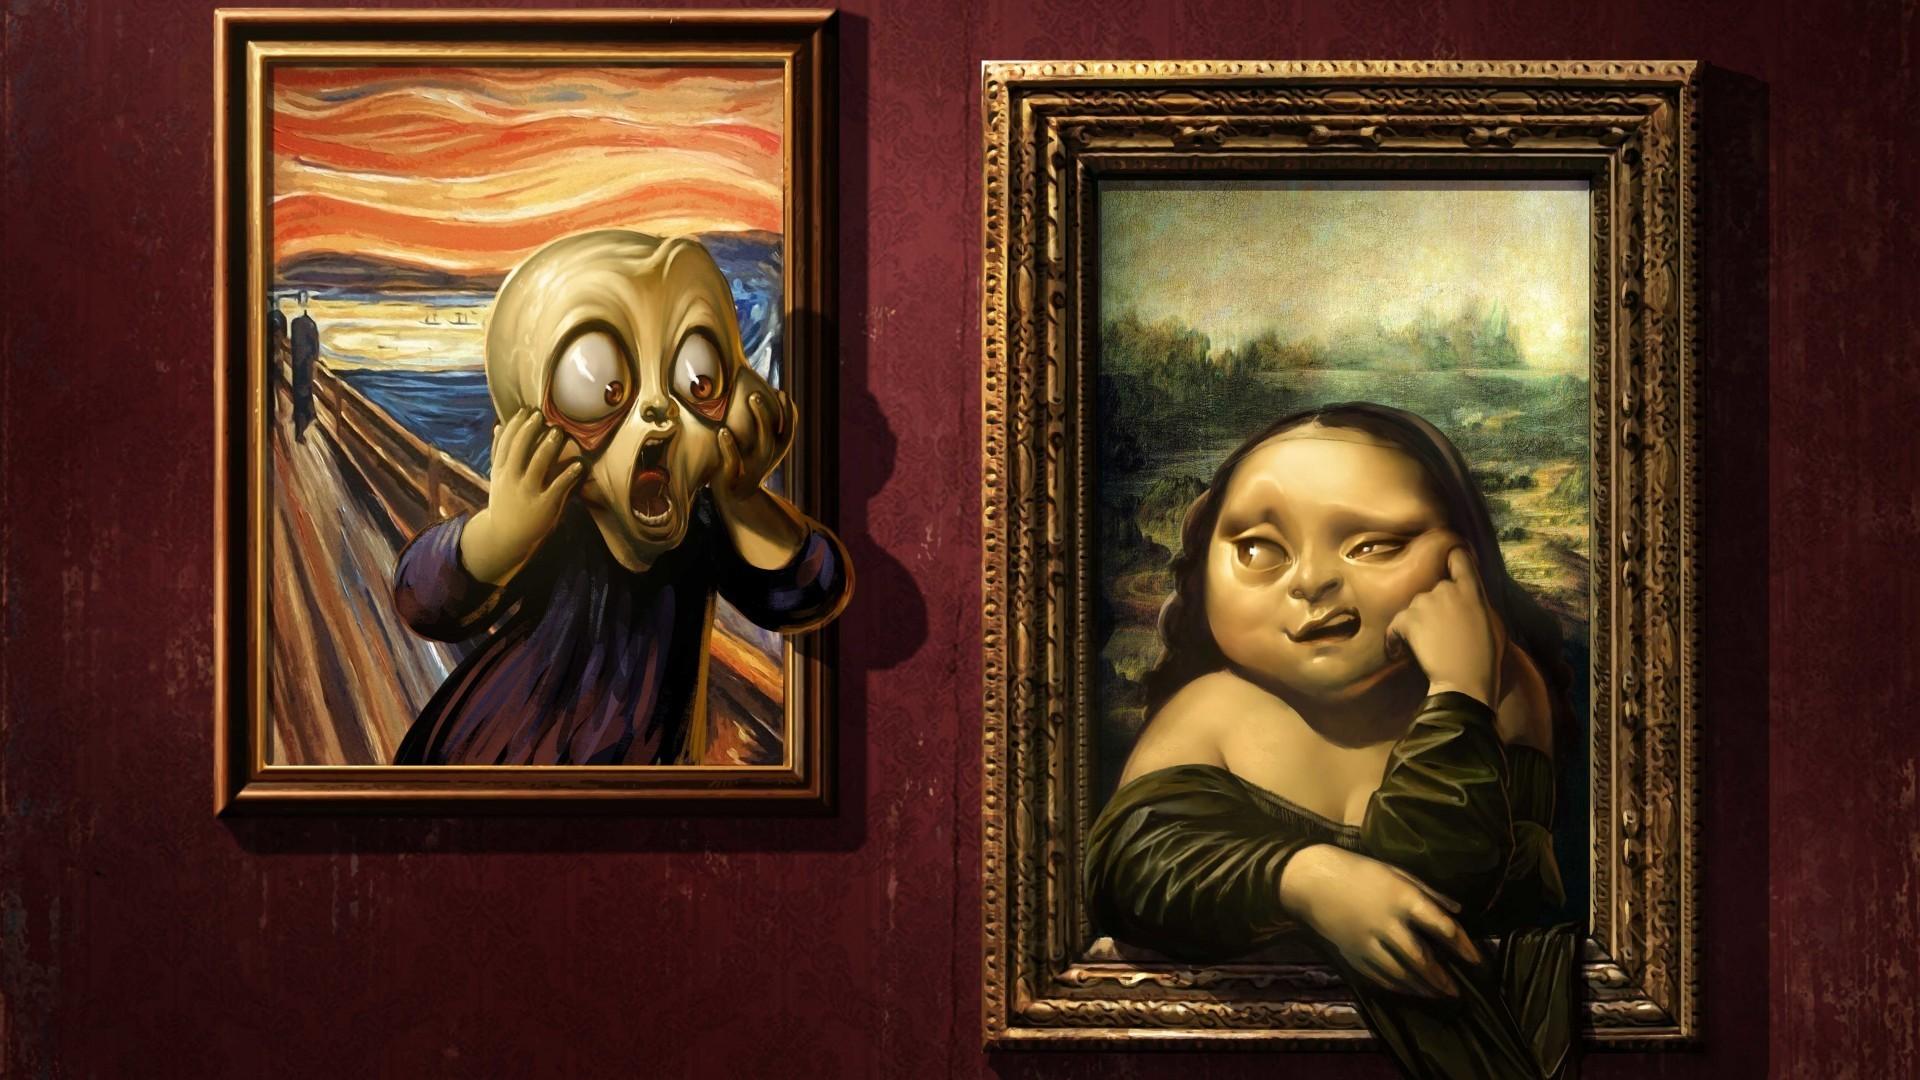 Fondos de pantalla : pintura, retrato, ventana, humor, pared, Obra ...